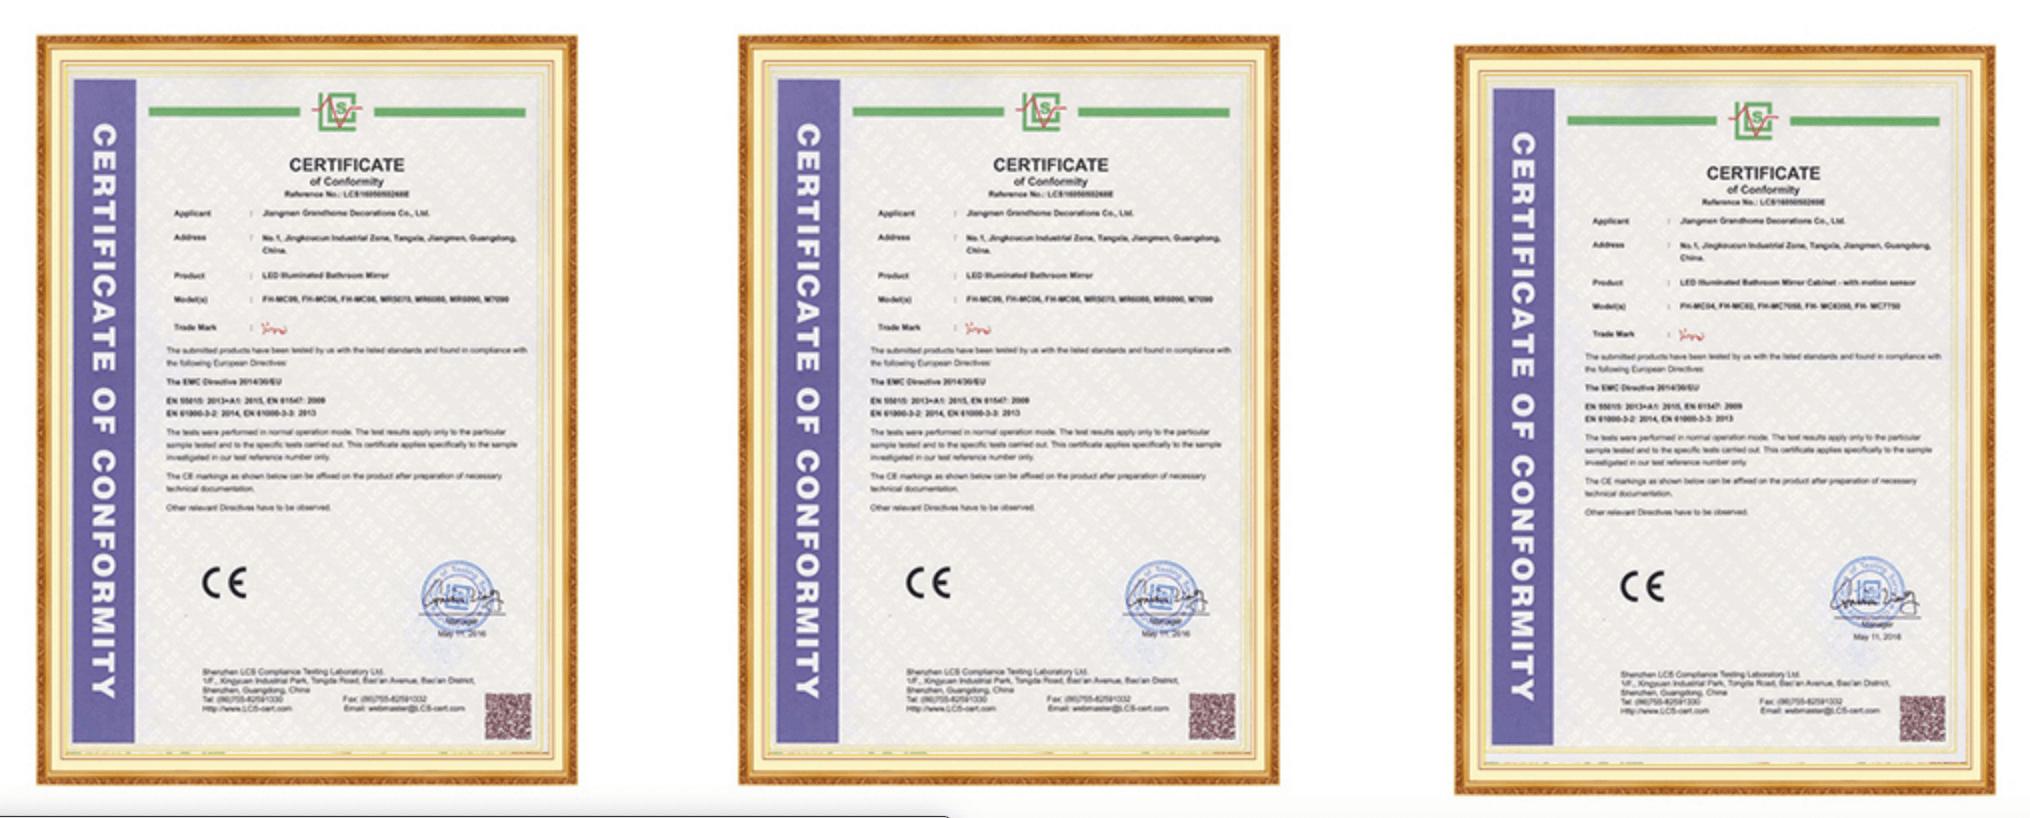 Custom Mirror Manufacturers certifications